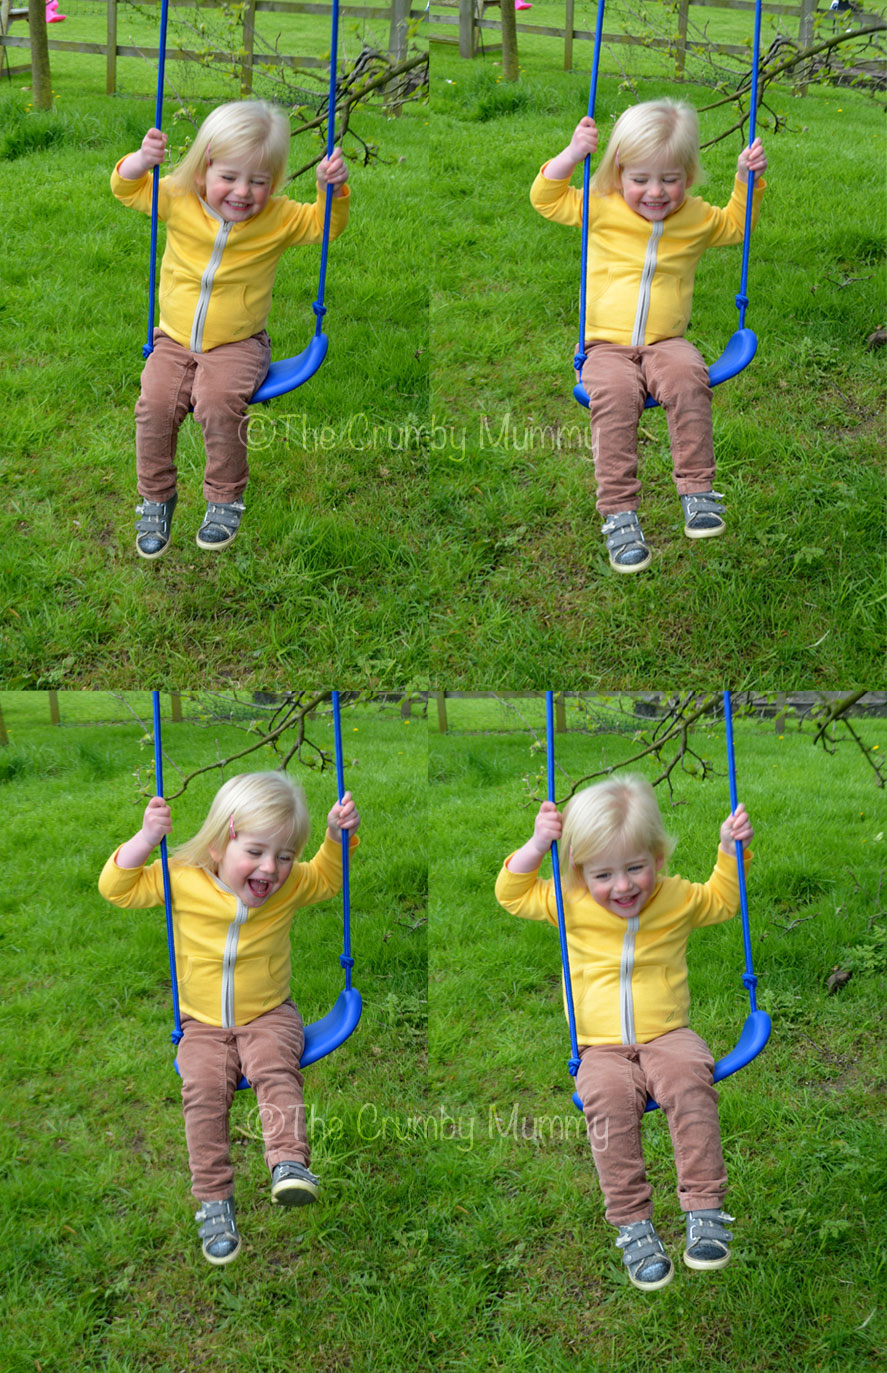 Swinging-Model